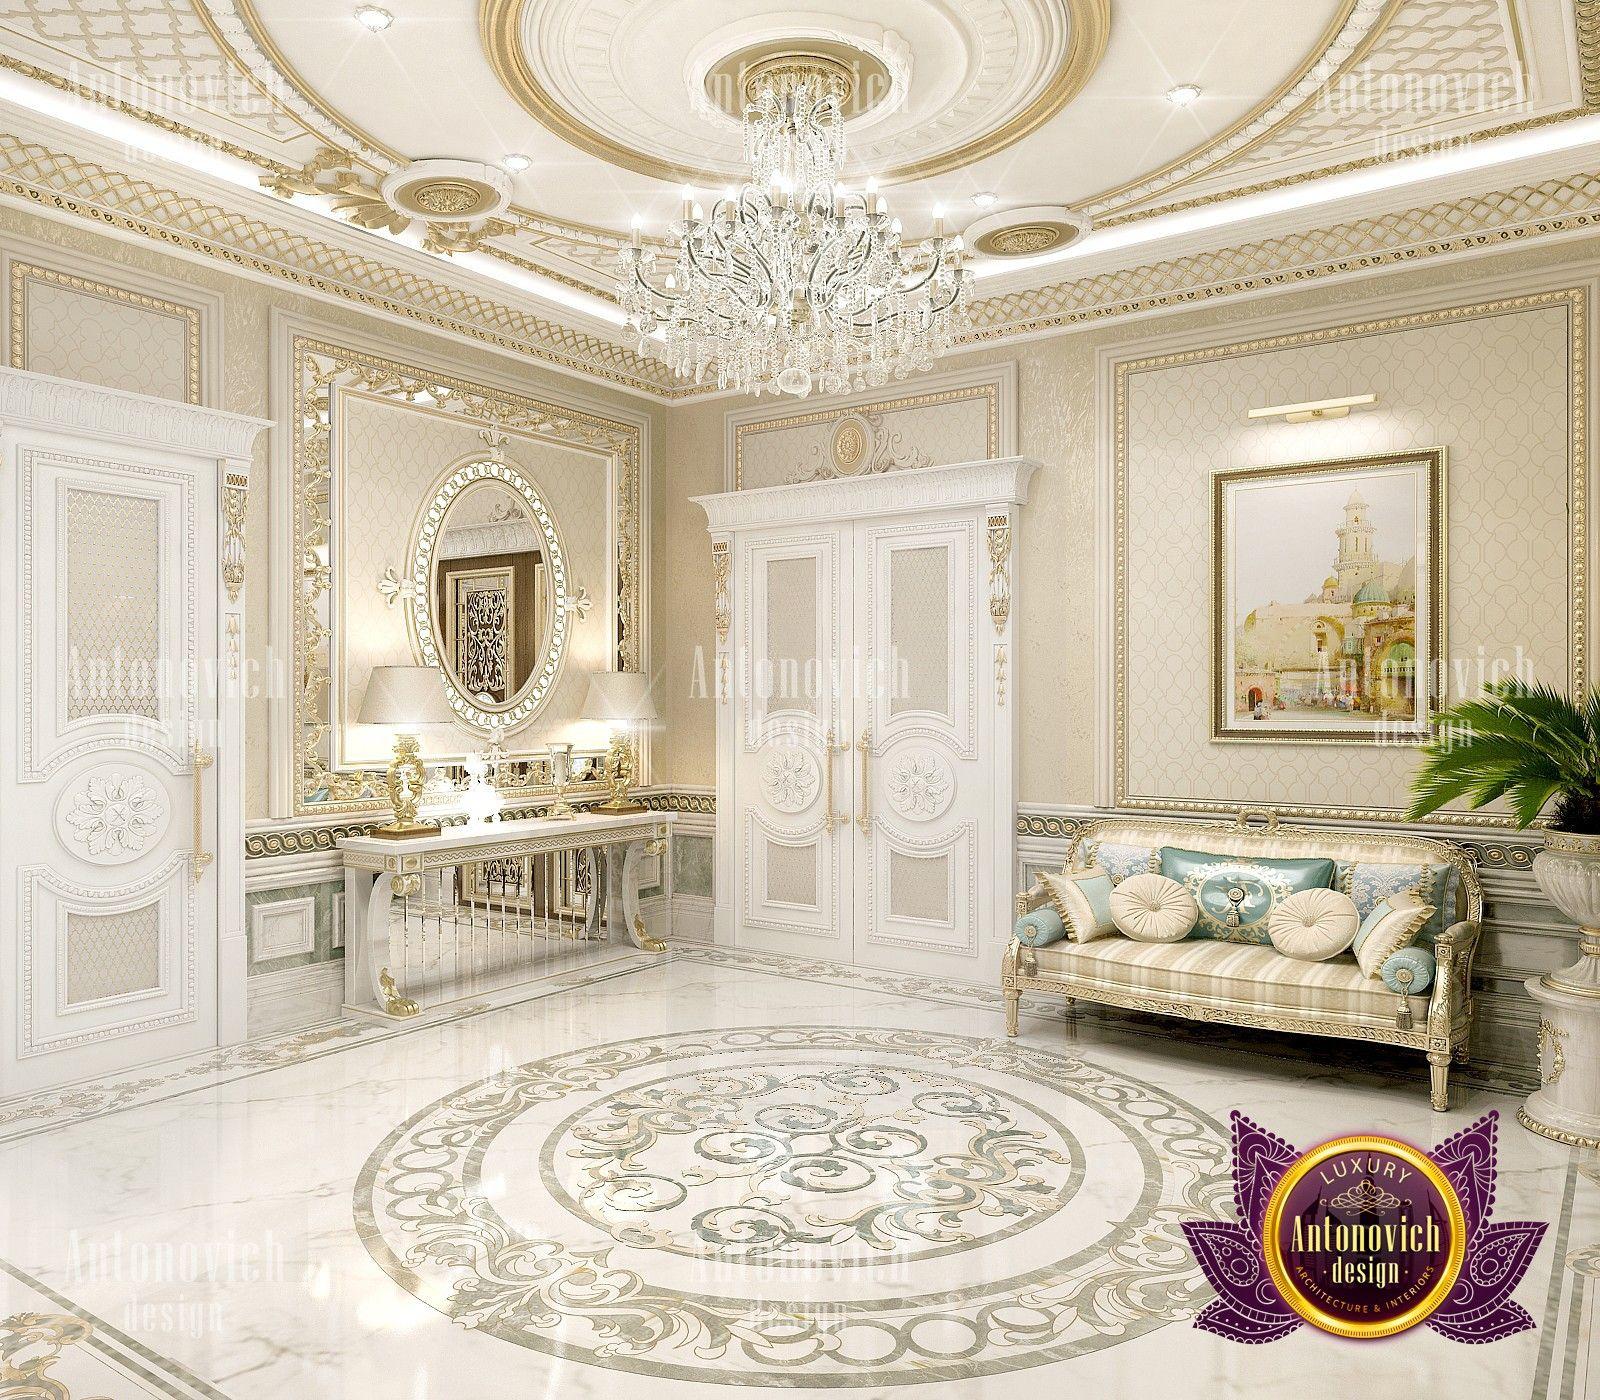 Pin By Luxury Antonovich Design On Halls From Antonovich